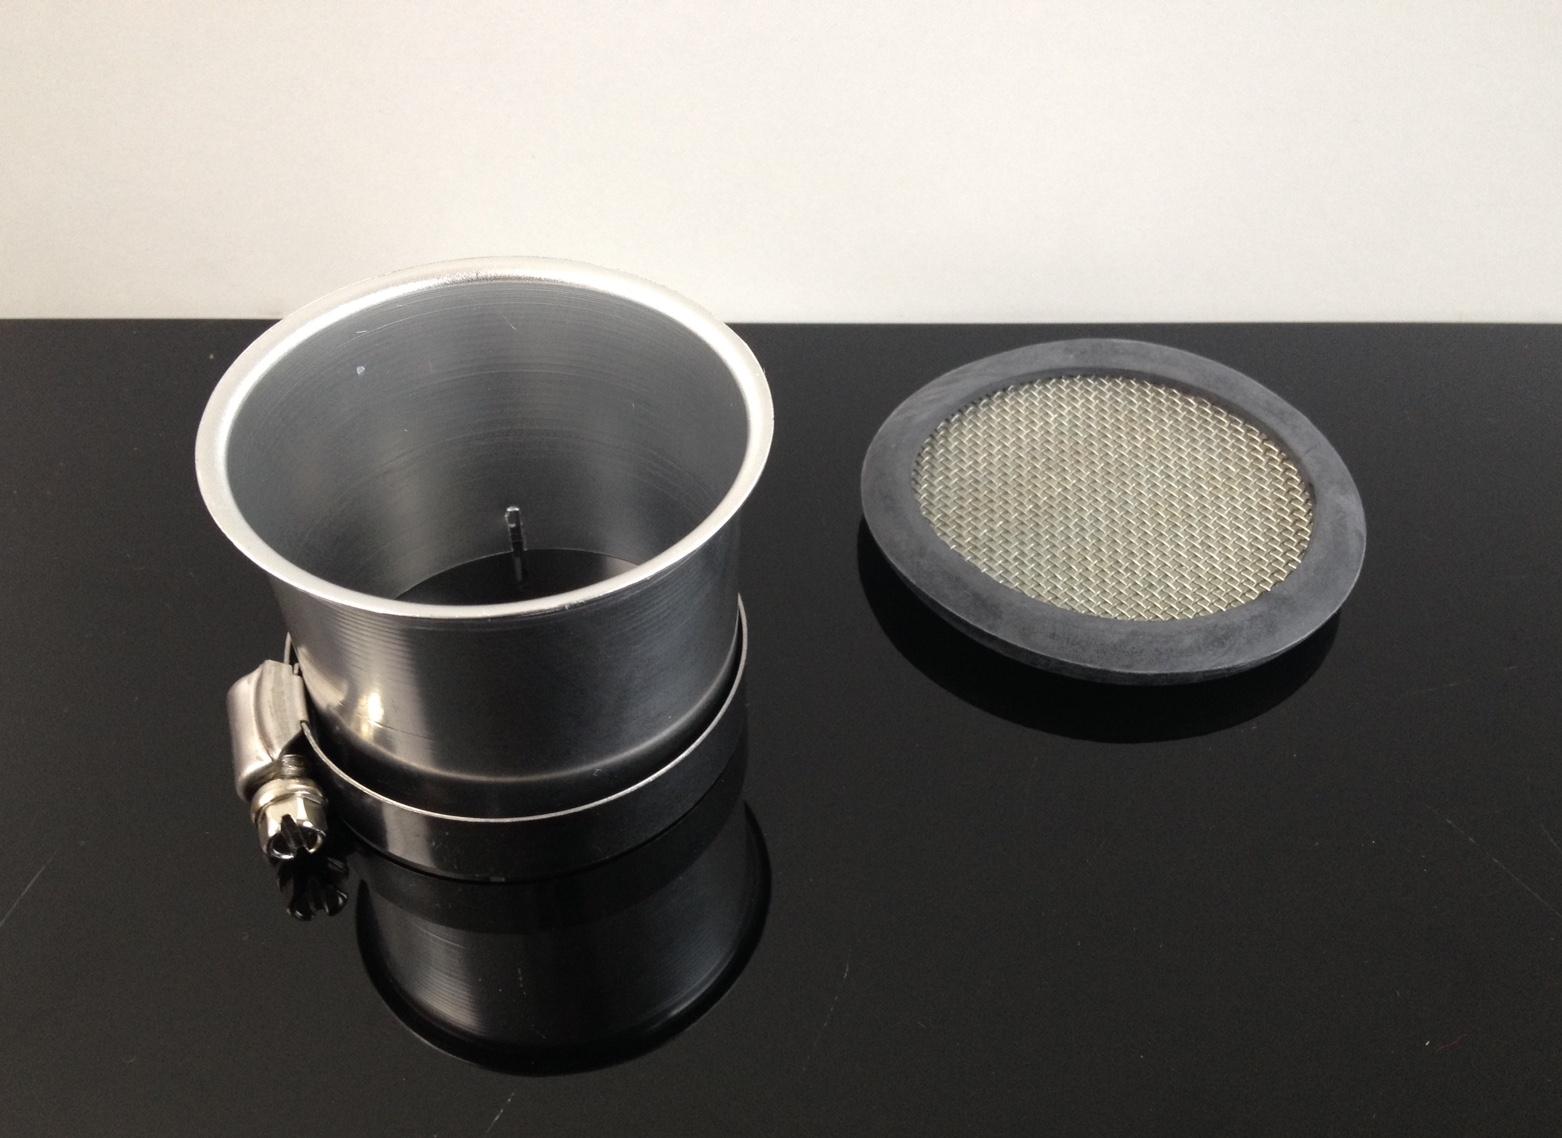 alu ansaugtrichter sieb carburetor cone funnel f mikuni vm36 und andere ebay. Black Bedroom Furniture Sets. Home Design Ideas